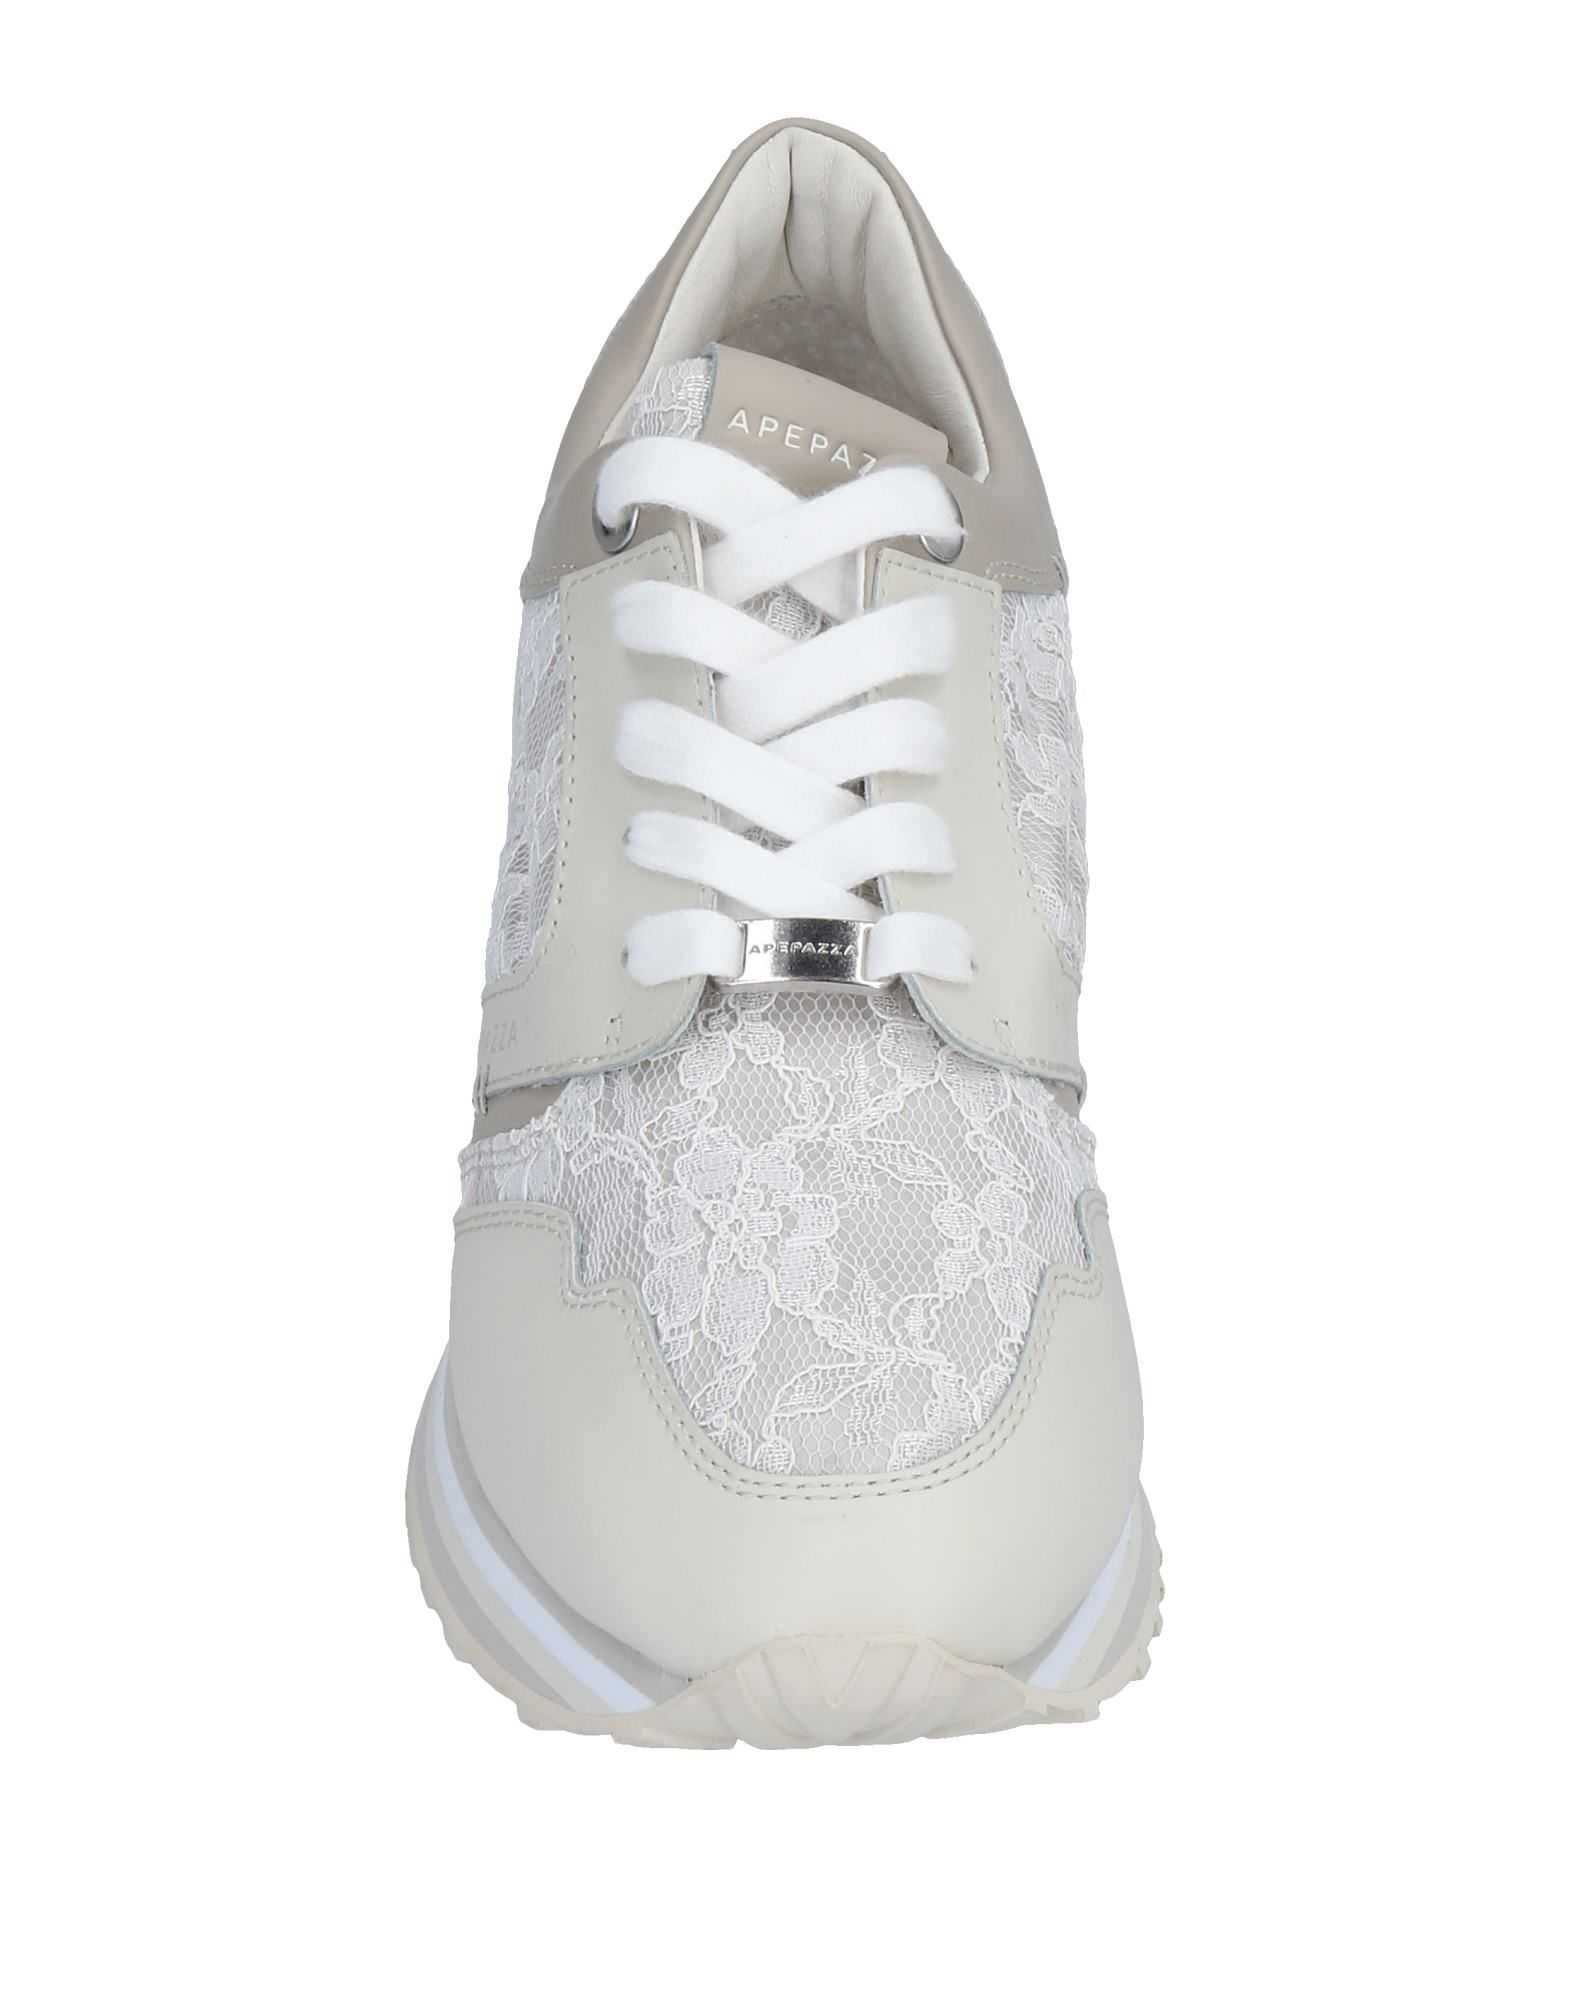 Apepazza Sneakers Damen Damen Damen  11481399FX Gute Qualität beliebte Schuhe cc750f